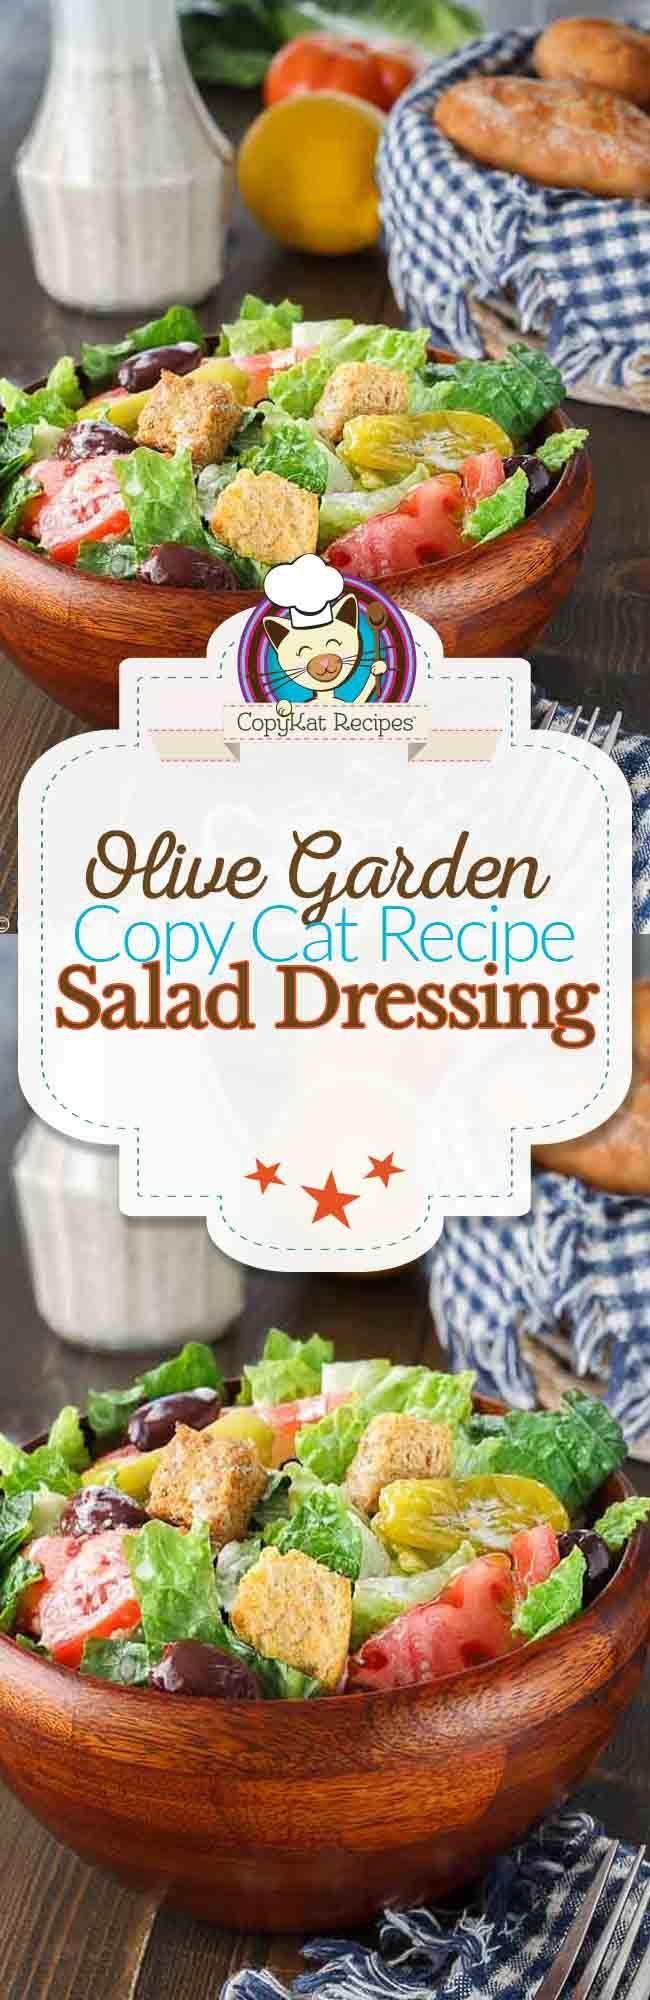 Olive Garden Salad Dressing Copycat Recipe Food